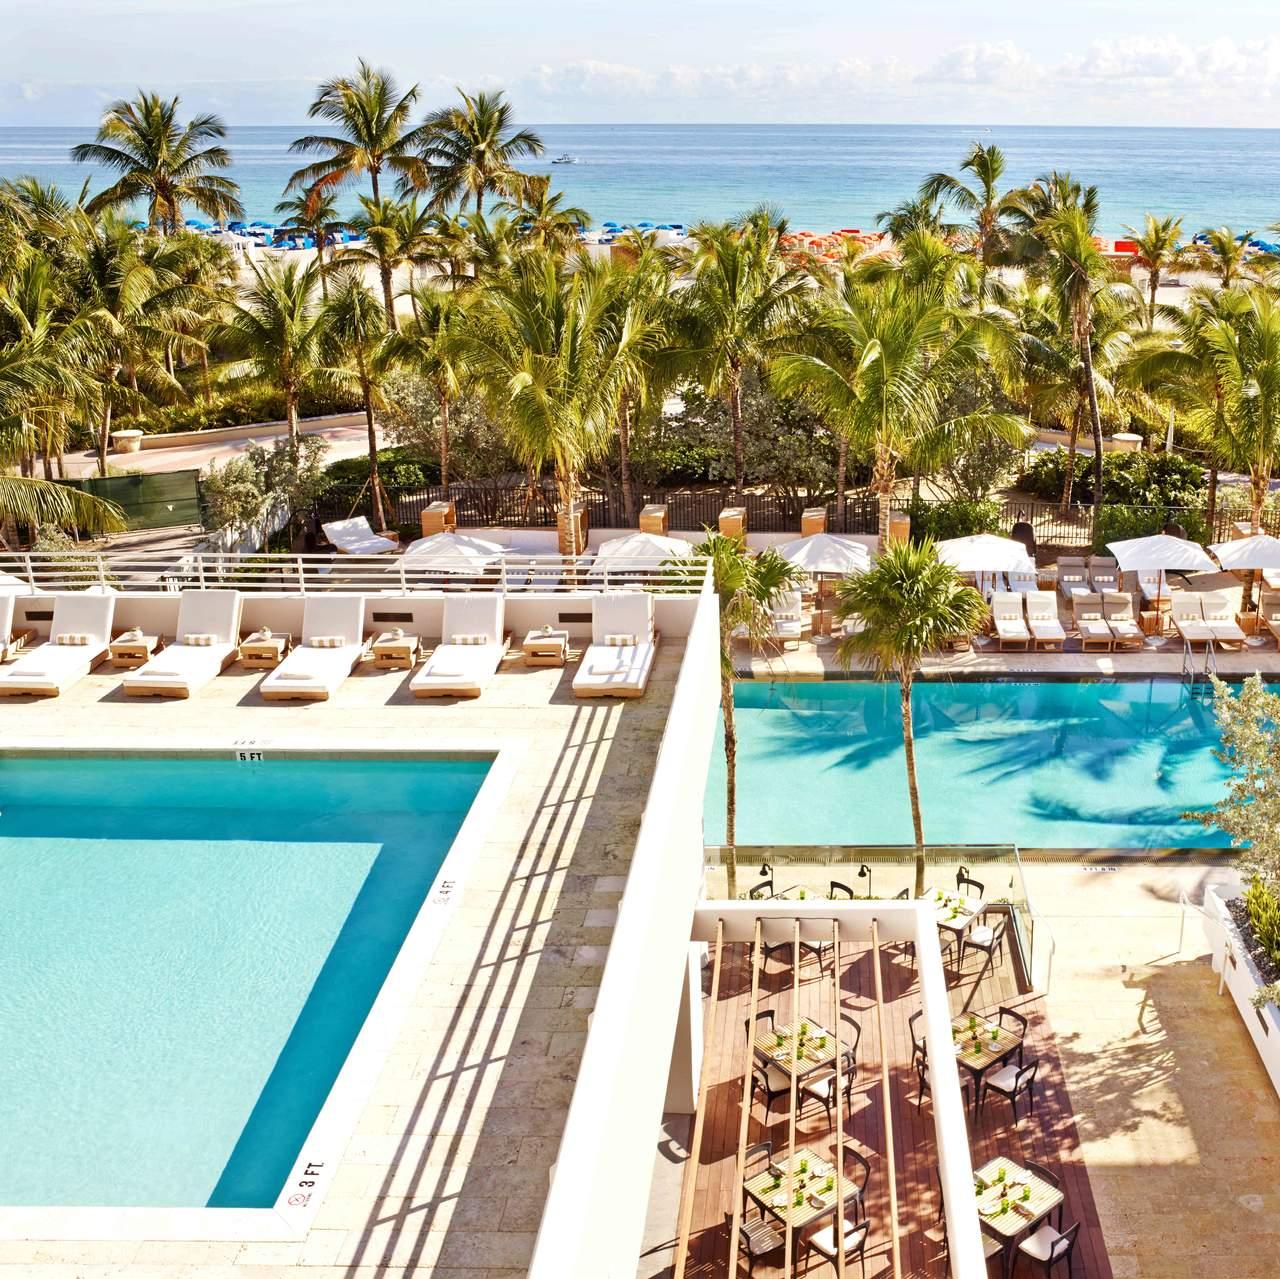 James Royal Palm Hotel South Beach Florida